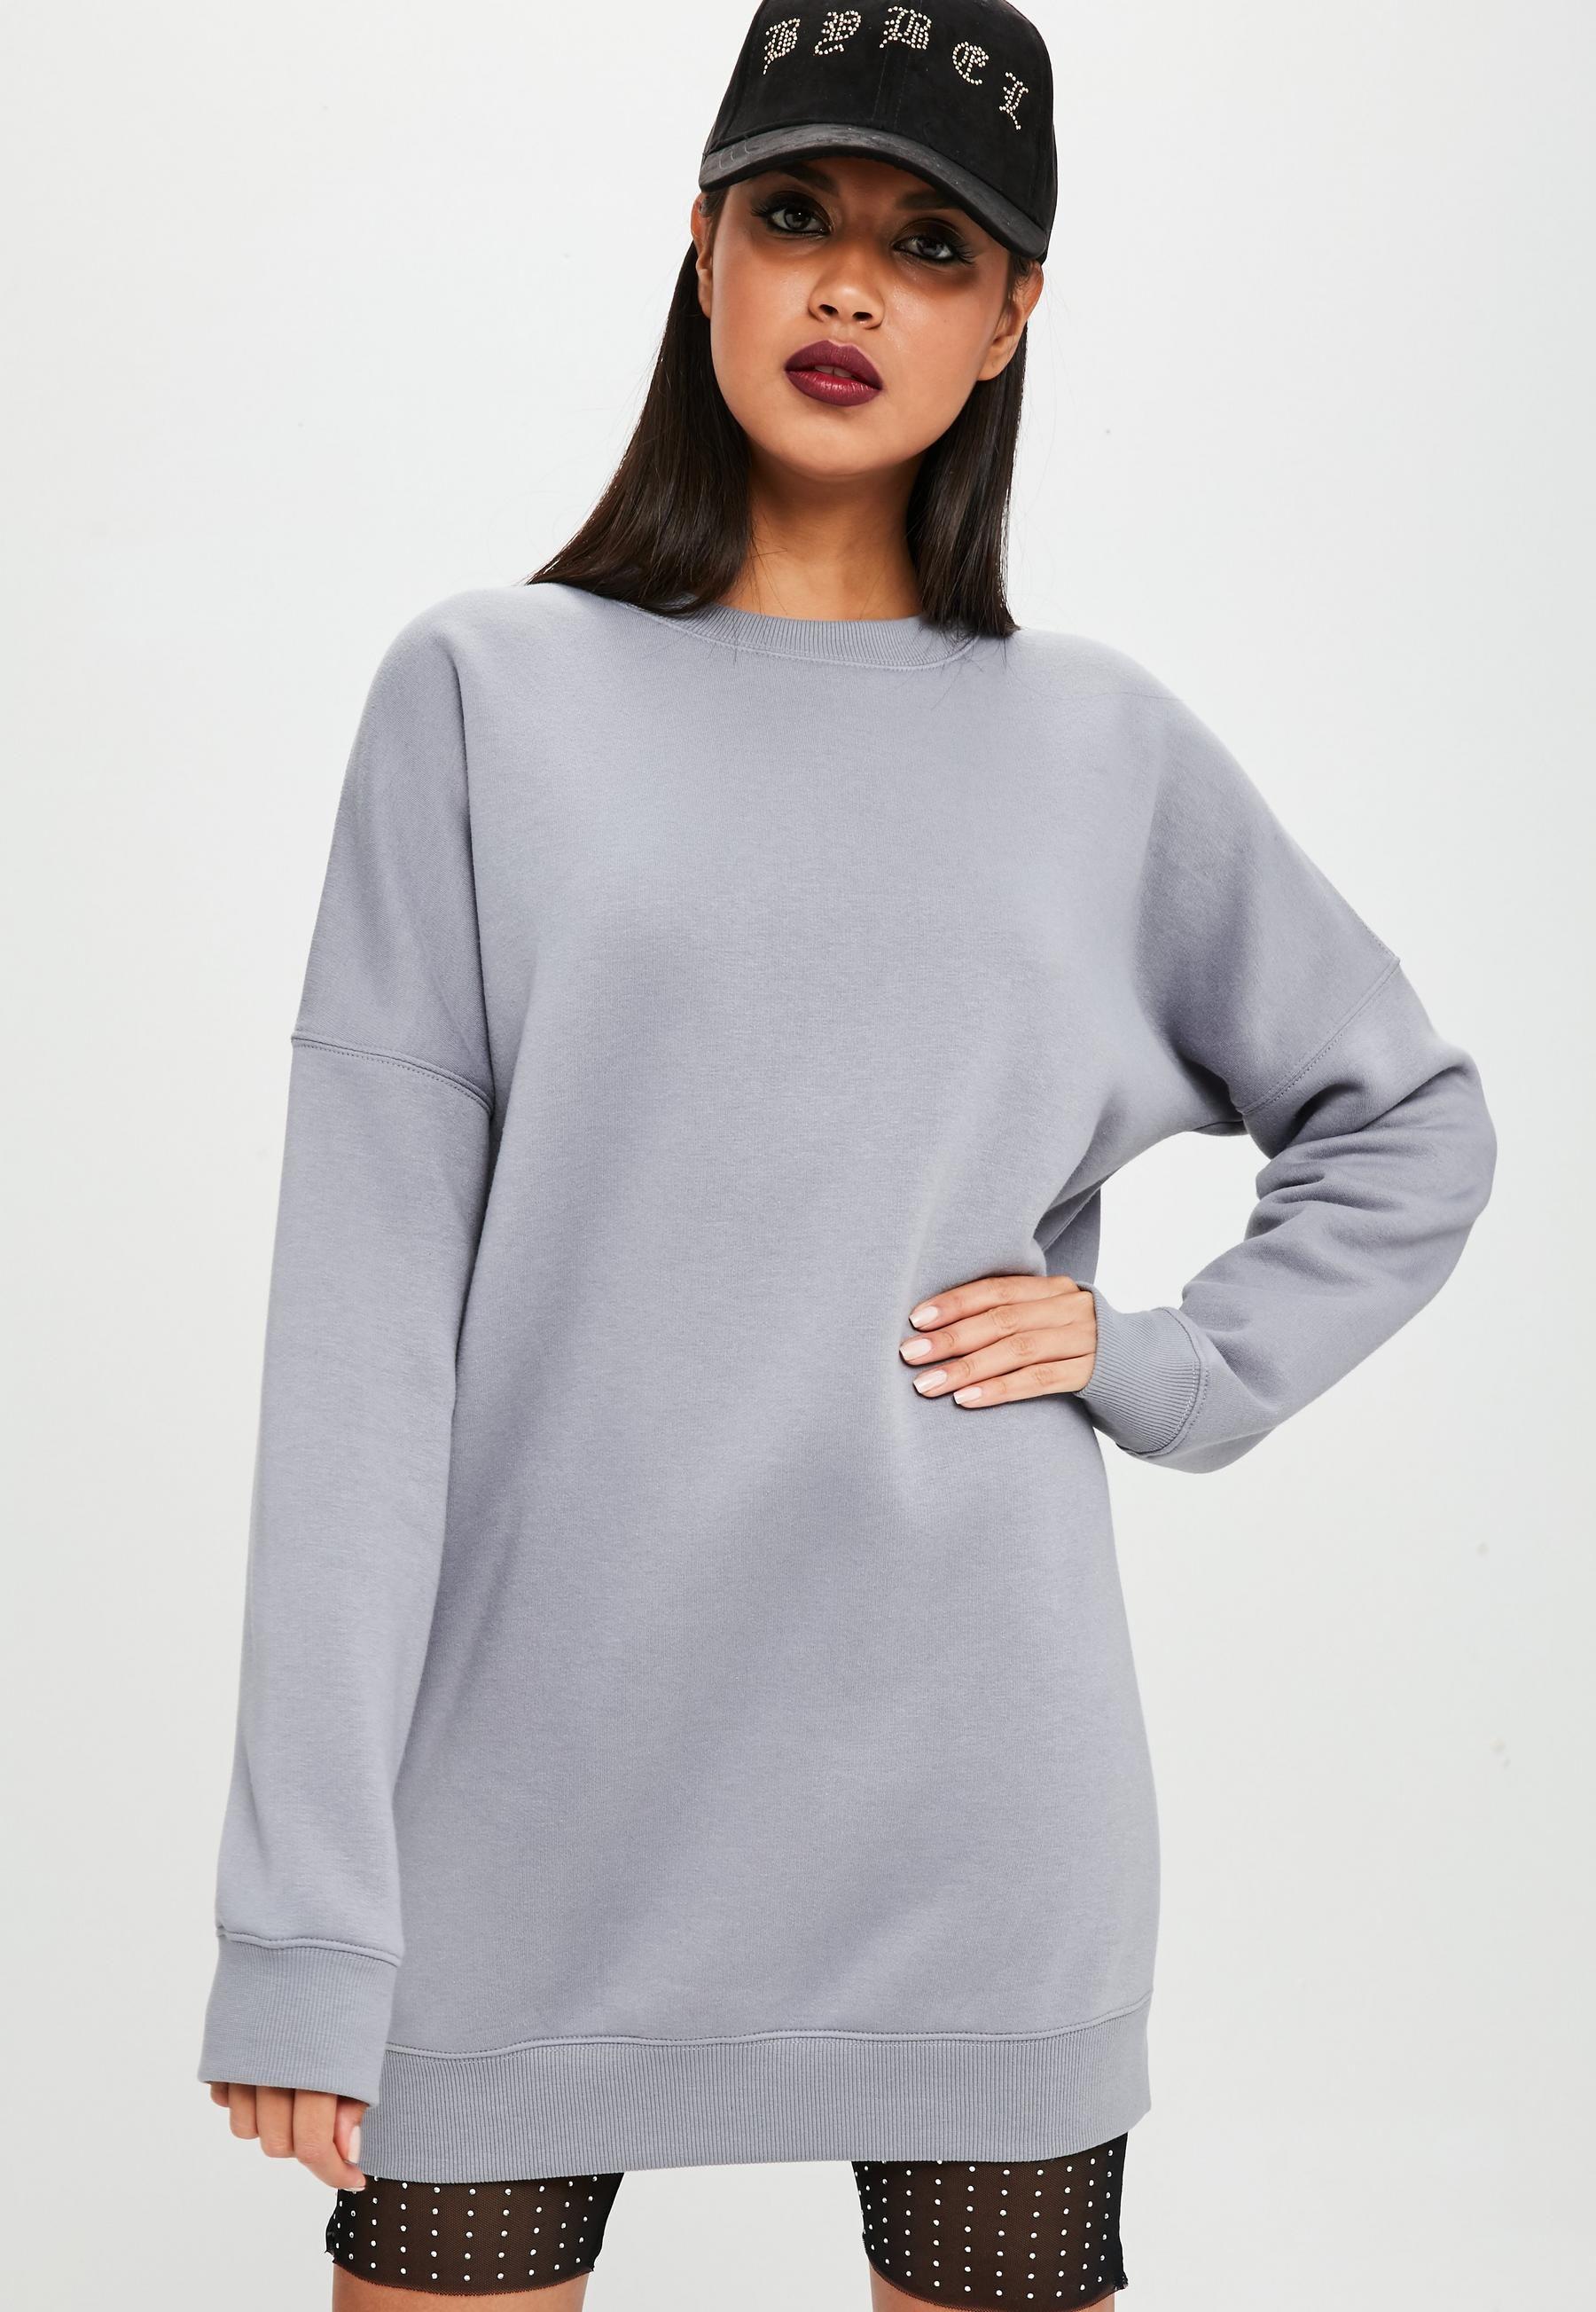 Carli Bybel X Missguided Gray Oversized Sweatshirt Dress Missguided Size Medium Grey Sweatshirt Dress Women Dress Online Oversized Jumper Dress [ 2607 x 1800 Pixel ]